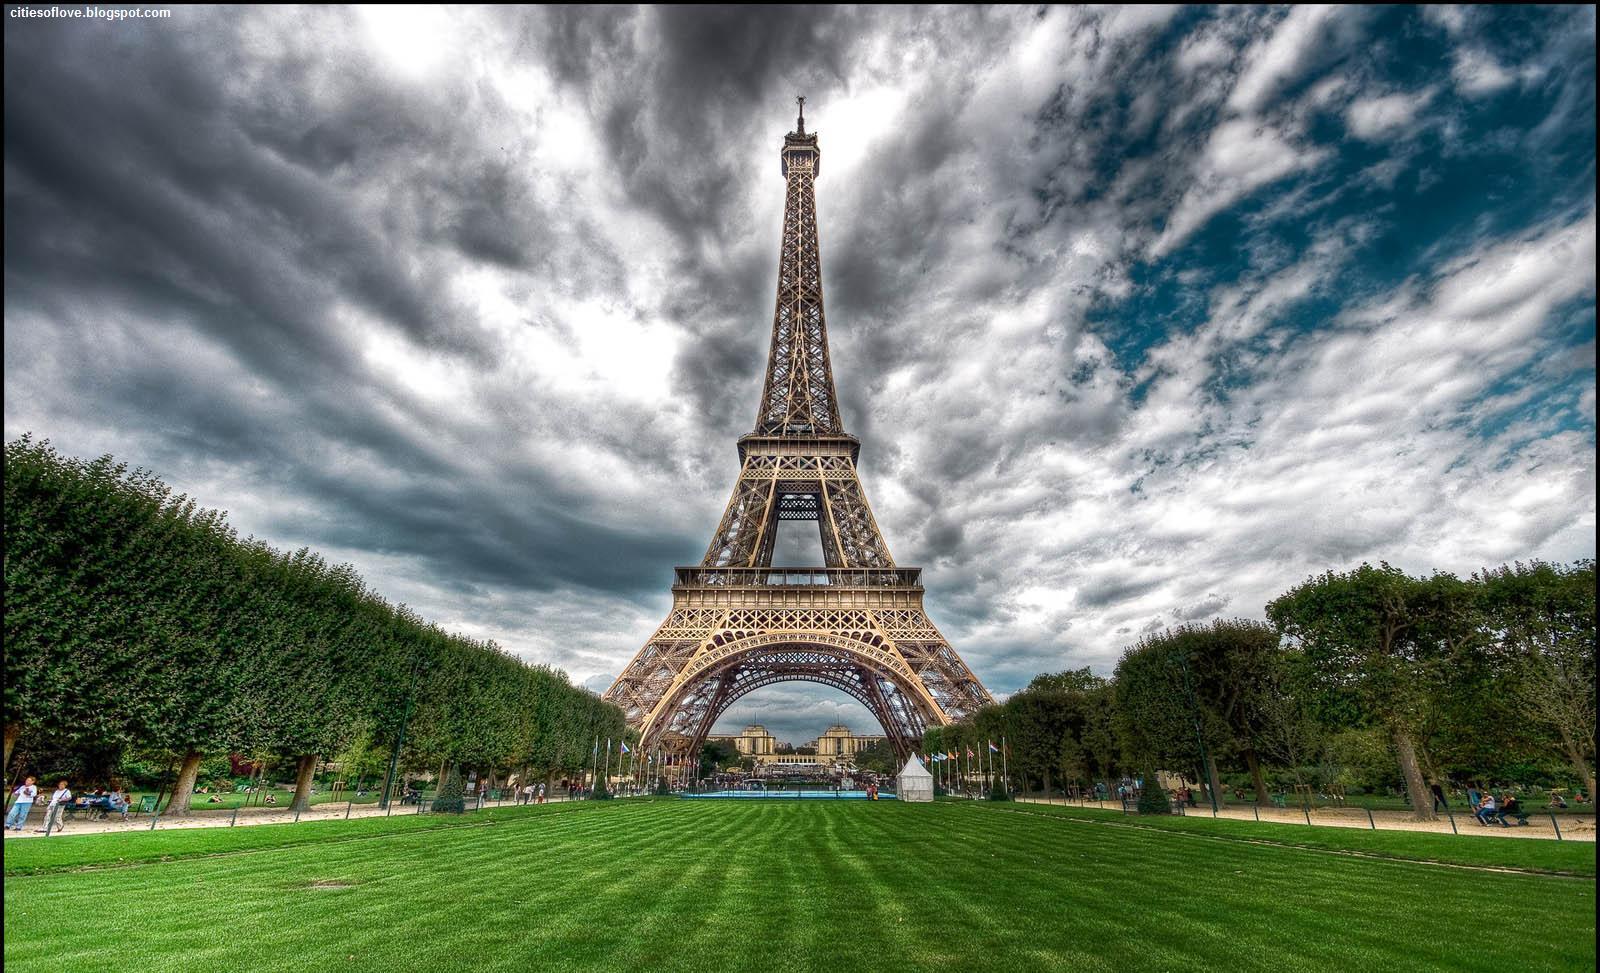 Paris Eiffel Tower France Wonderful And Magical Ambiance Hd